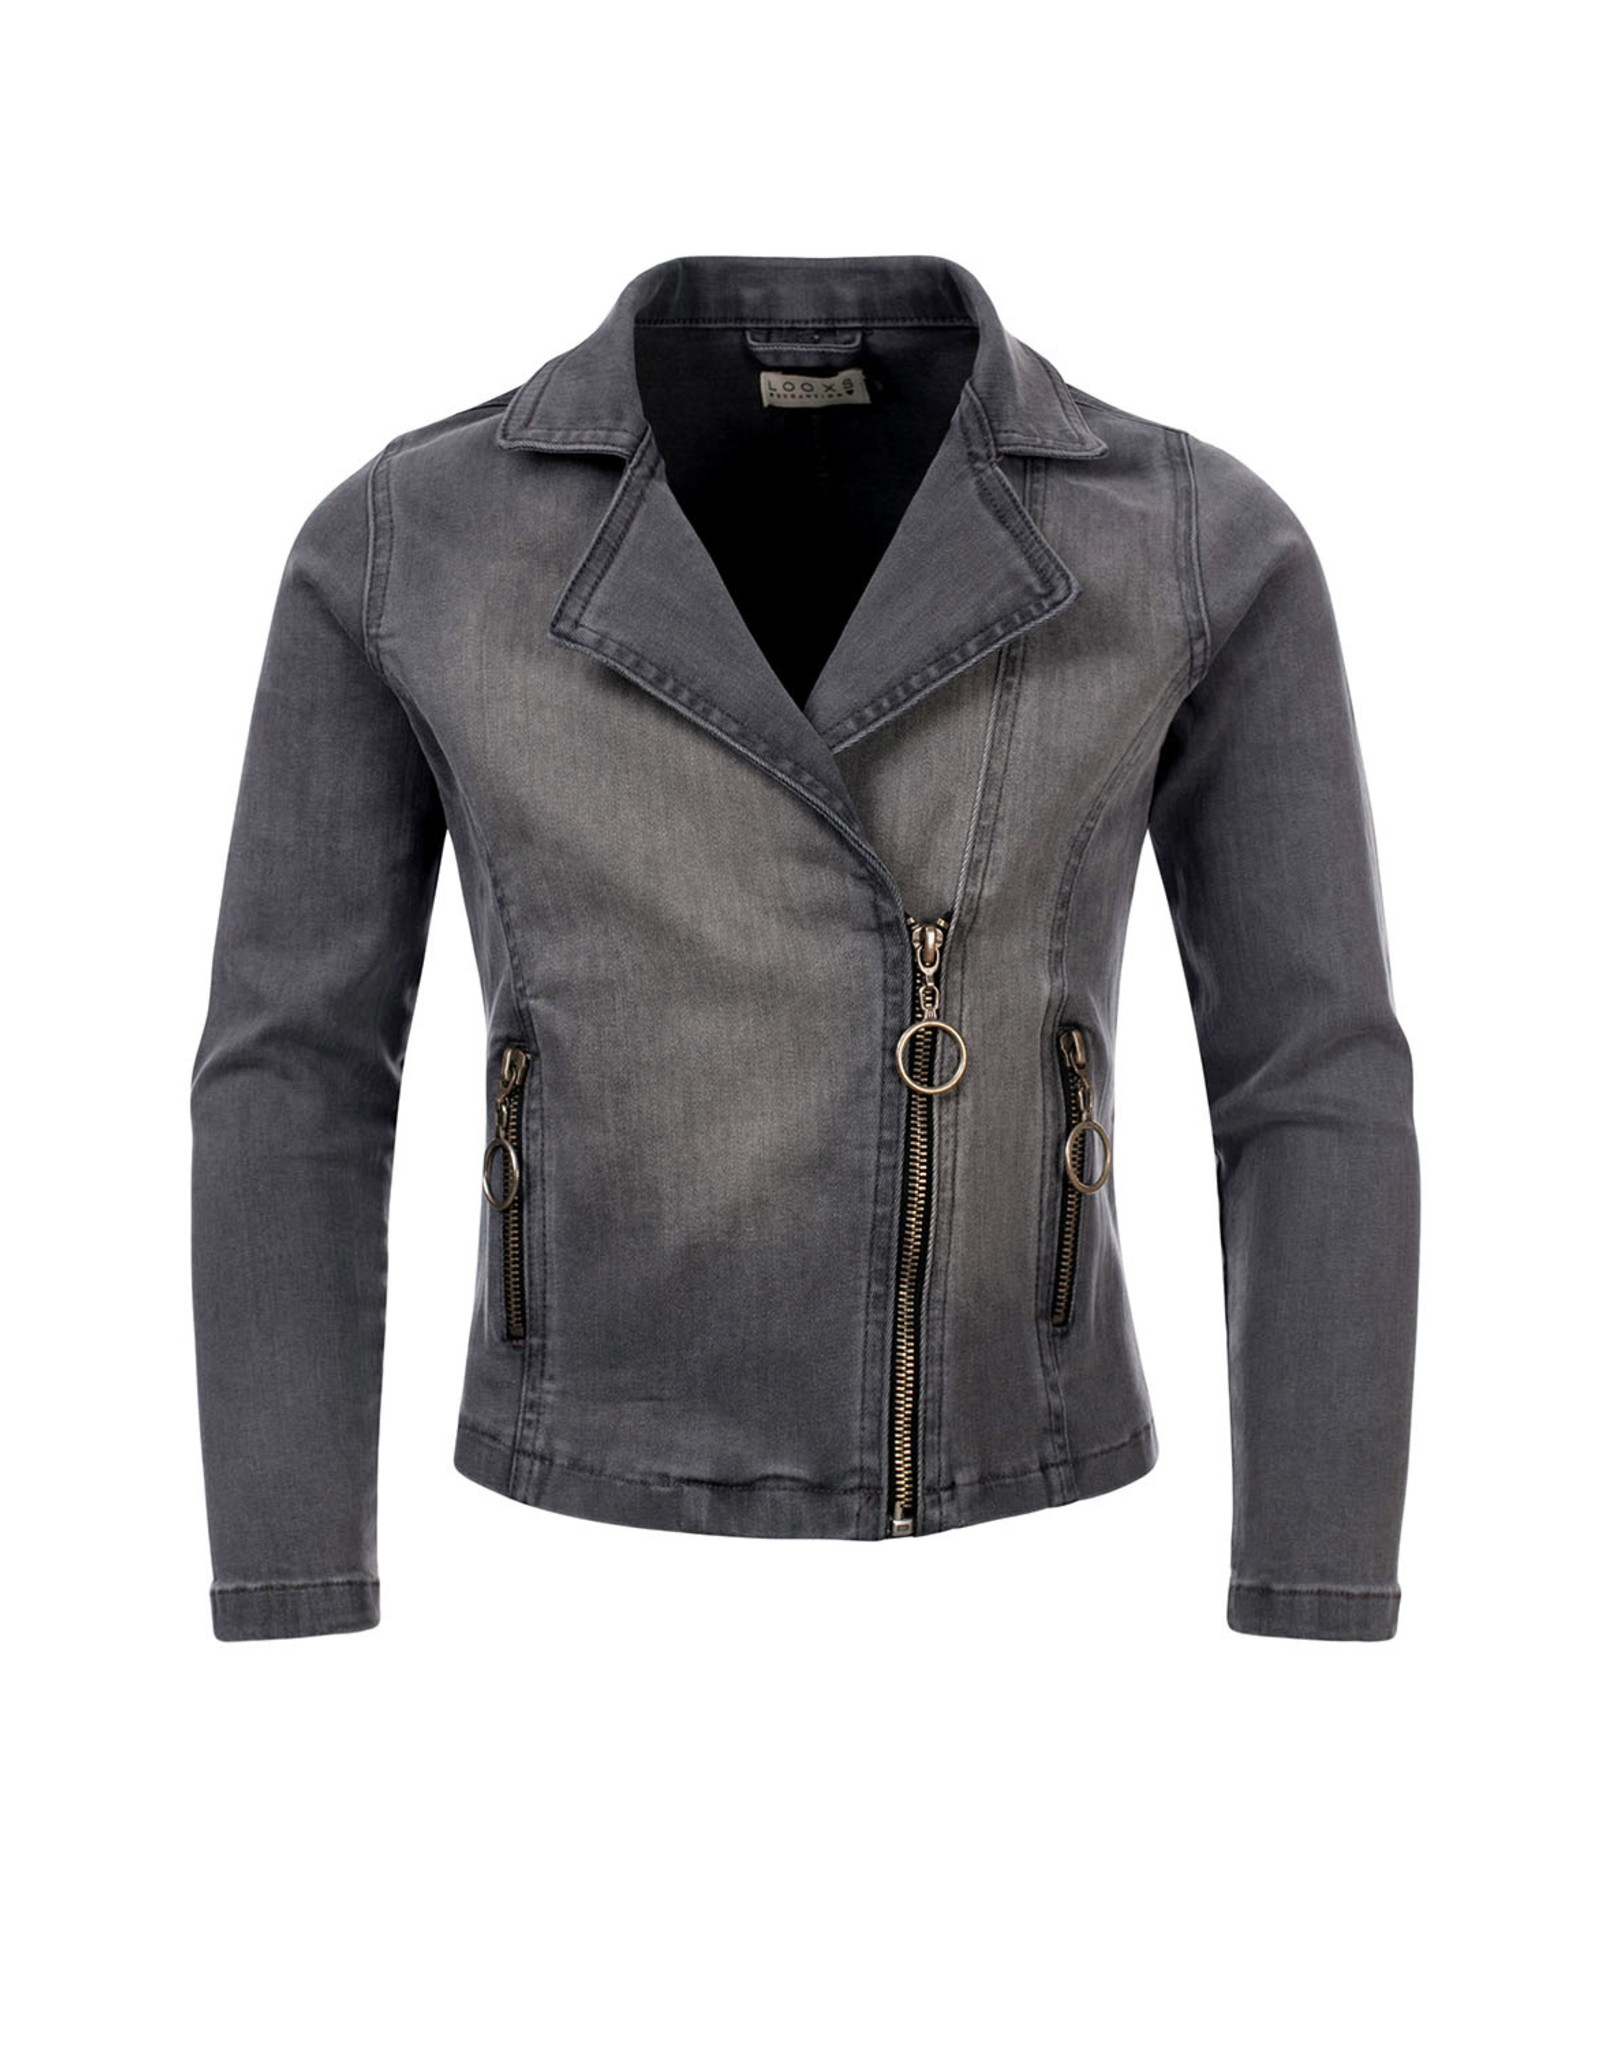 Looxs 10SIXTEEN 10Sixteen biker jacket soft grey